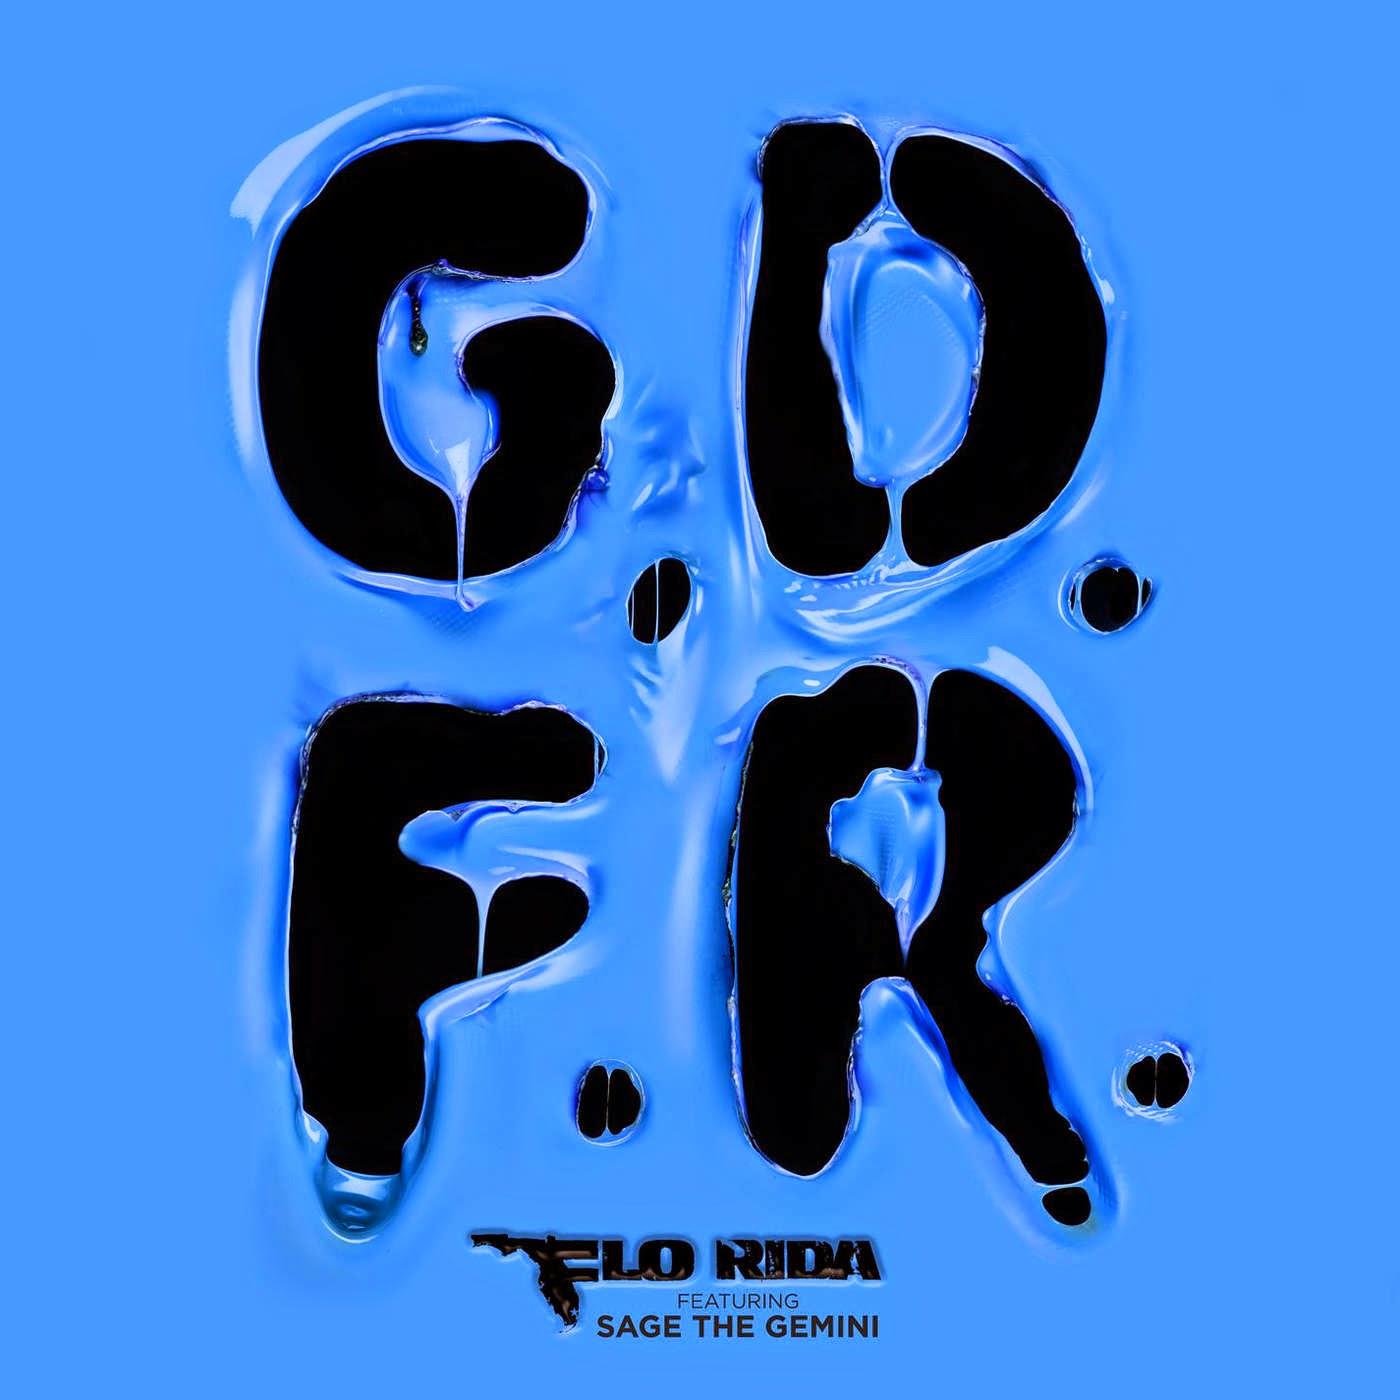 Flo Rida - GDFR (feat. Sage the Gemini & Lookas) - Single Cover